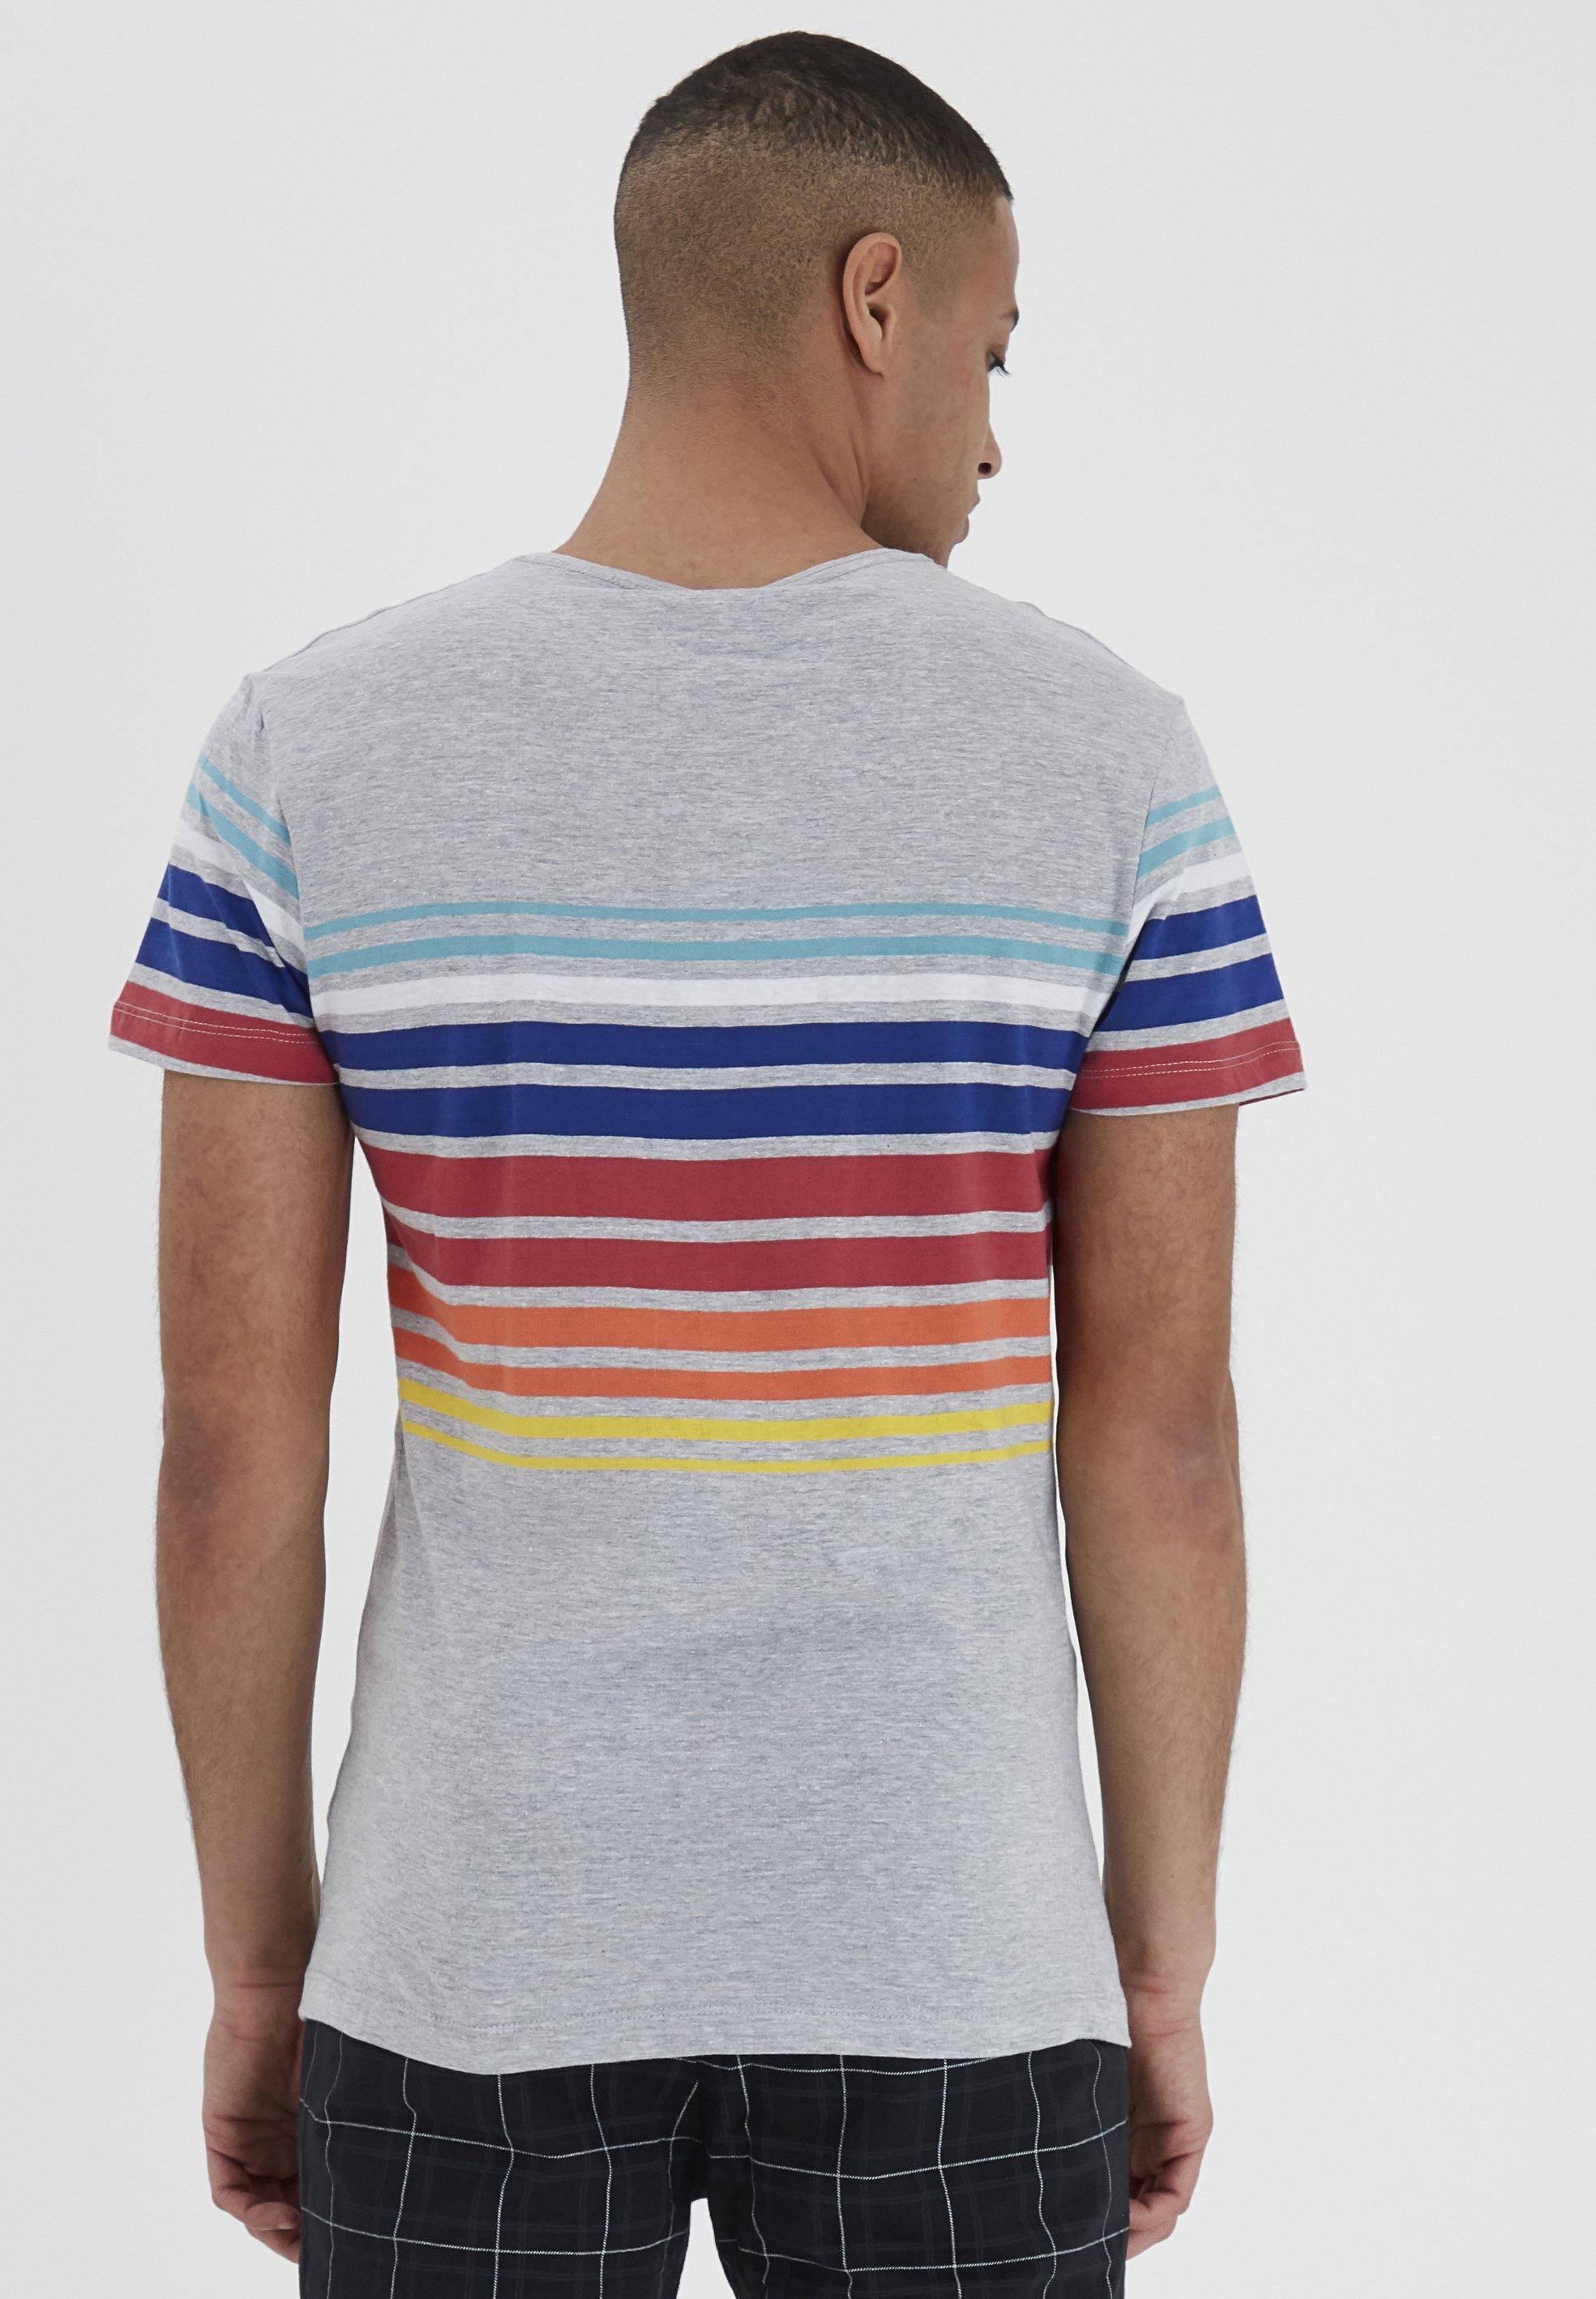 Blend Print T-shirt - stone mix 8EbpB